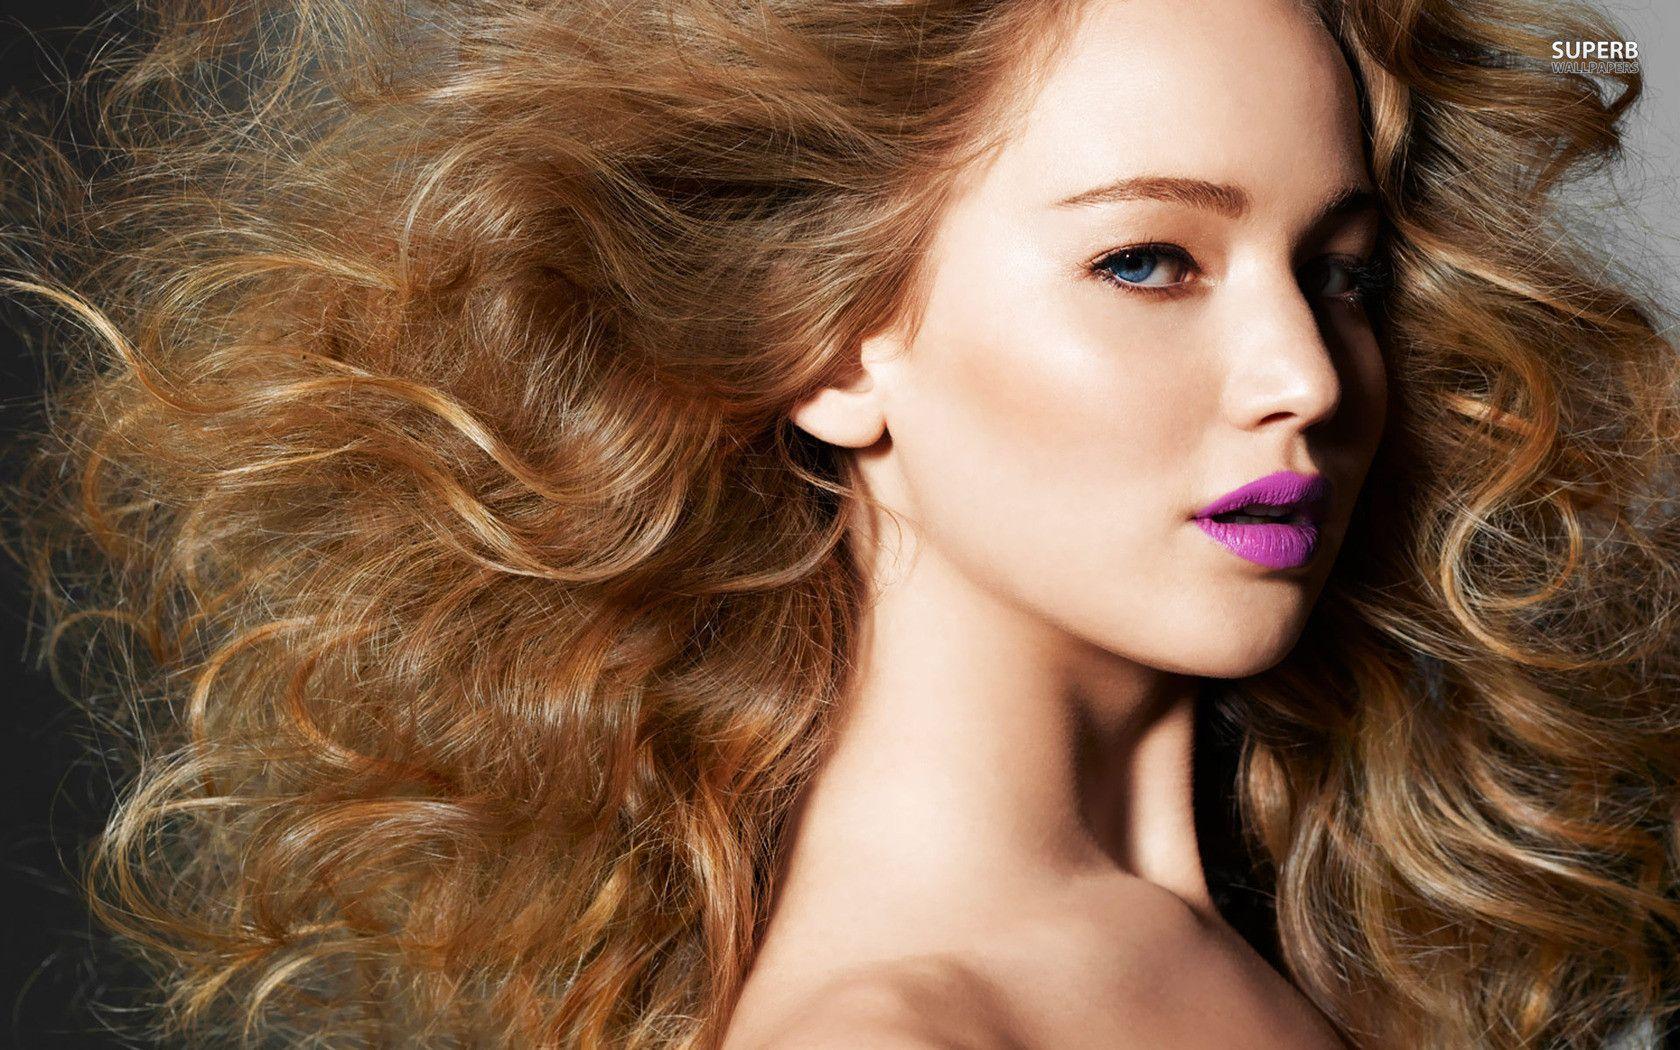 Jennifer Lawrence Background 2014 Background 1 HD Wallpapers ...